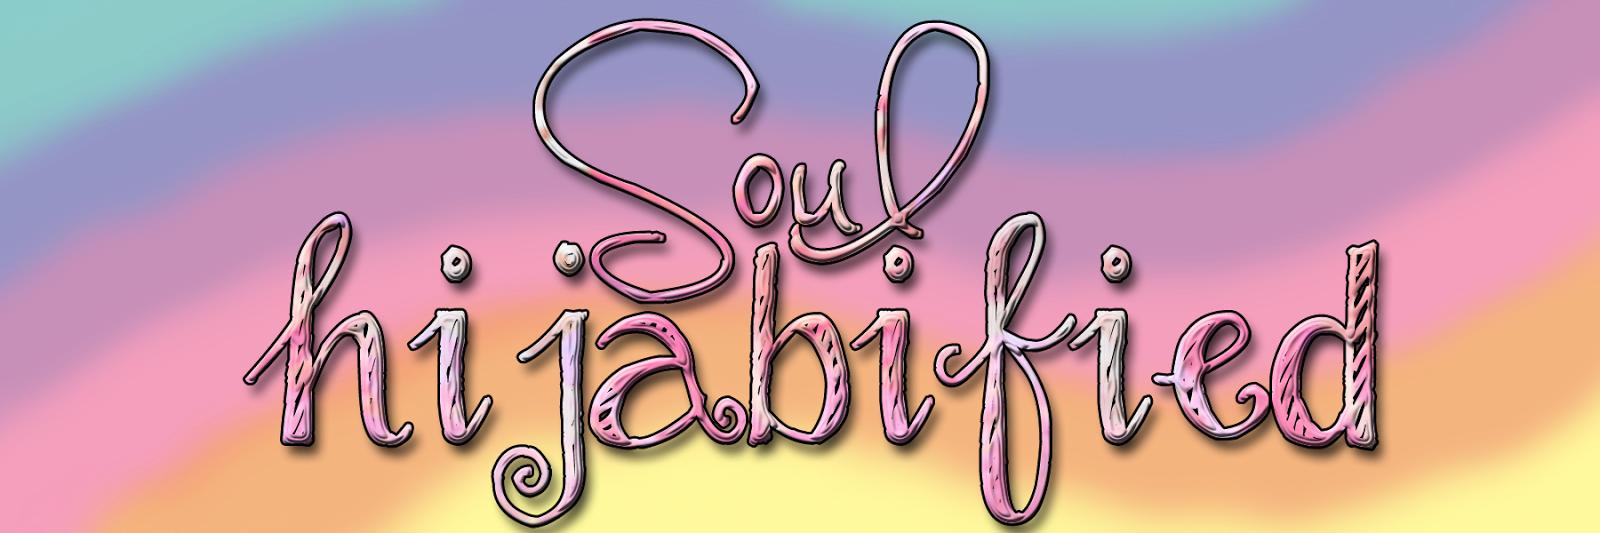 Soul Hijabified